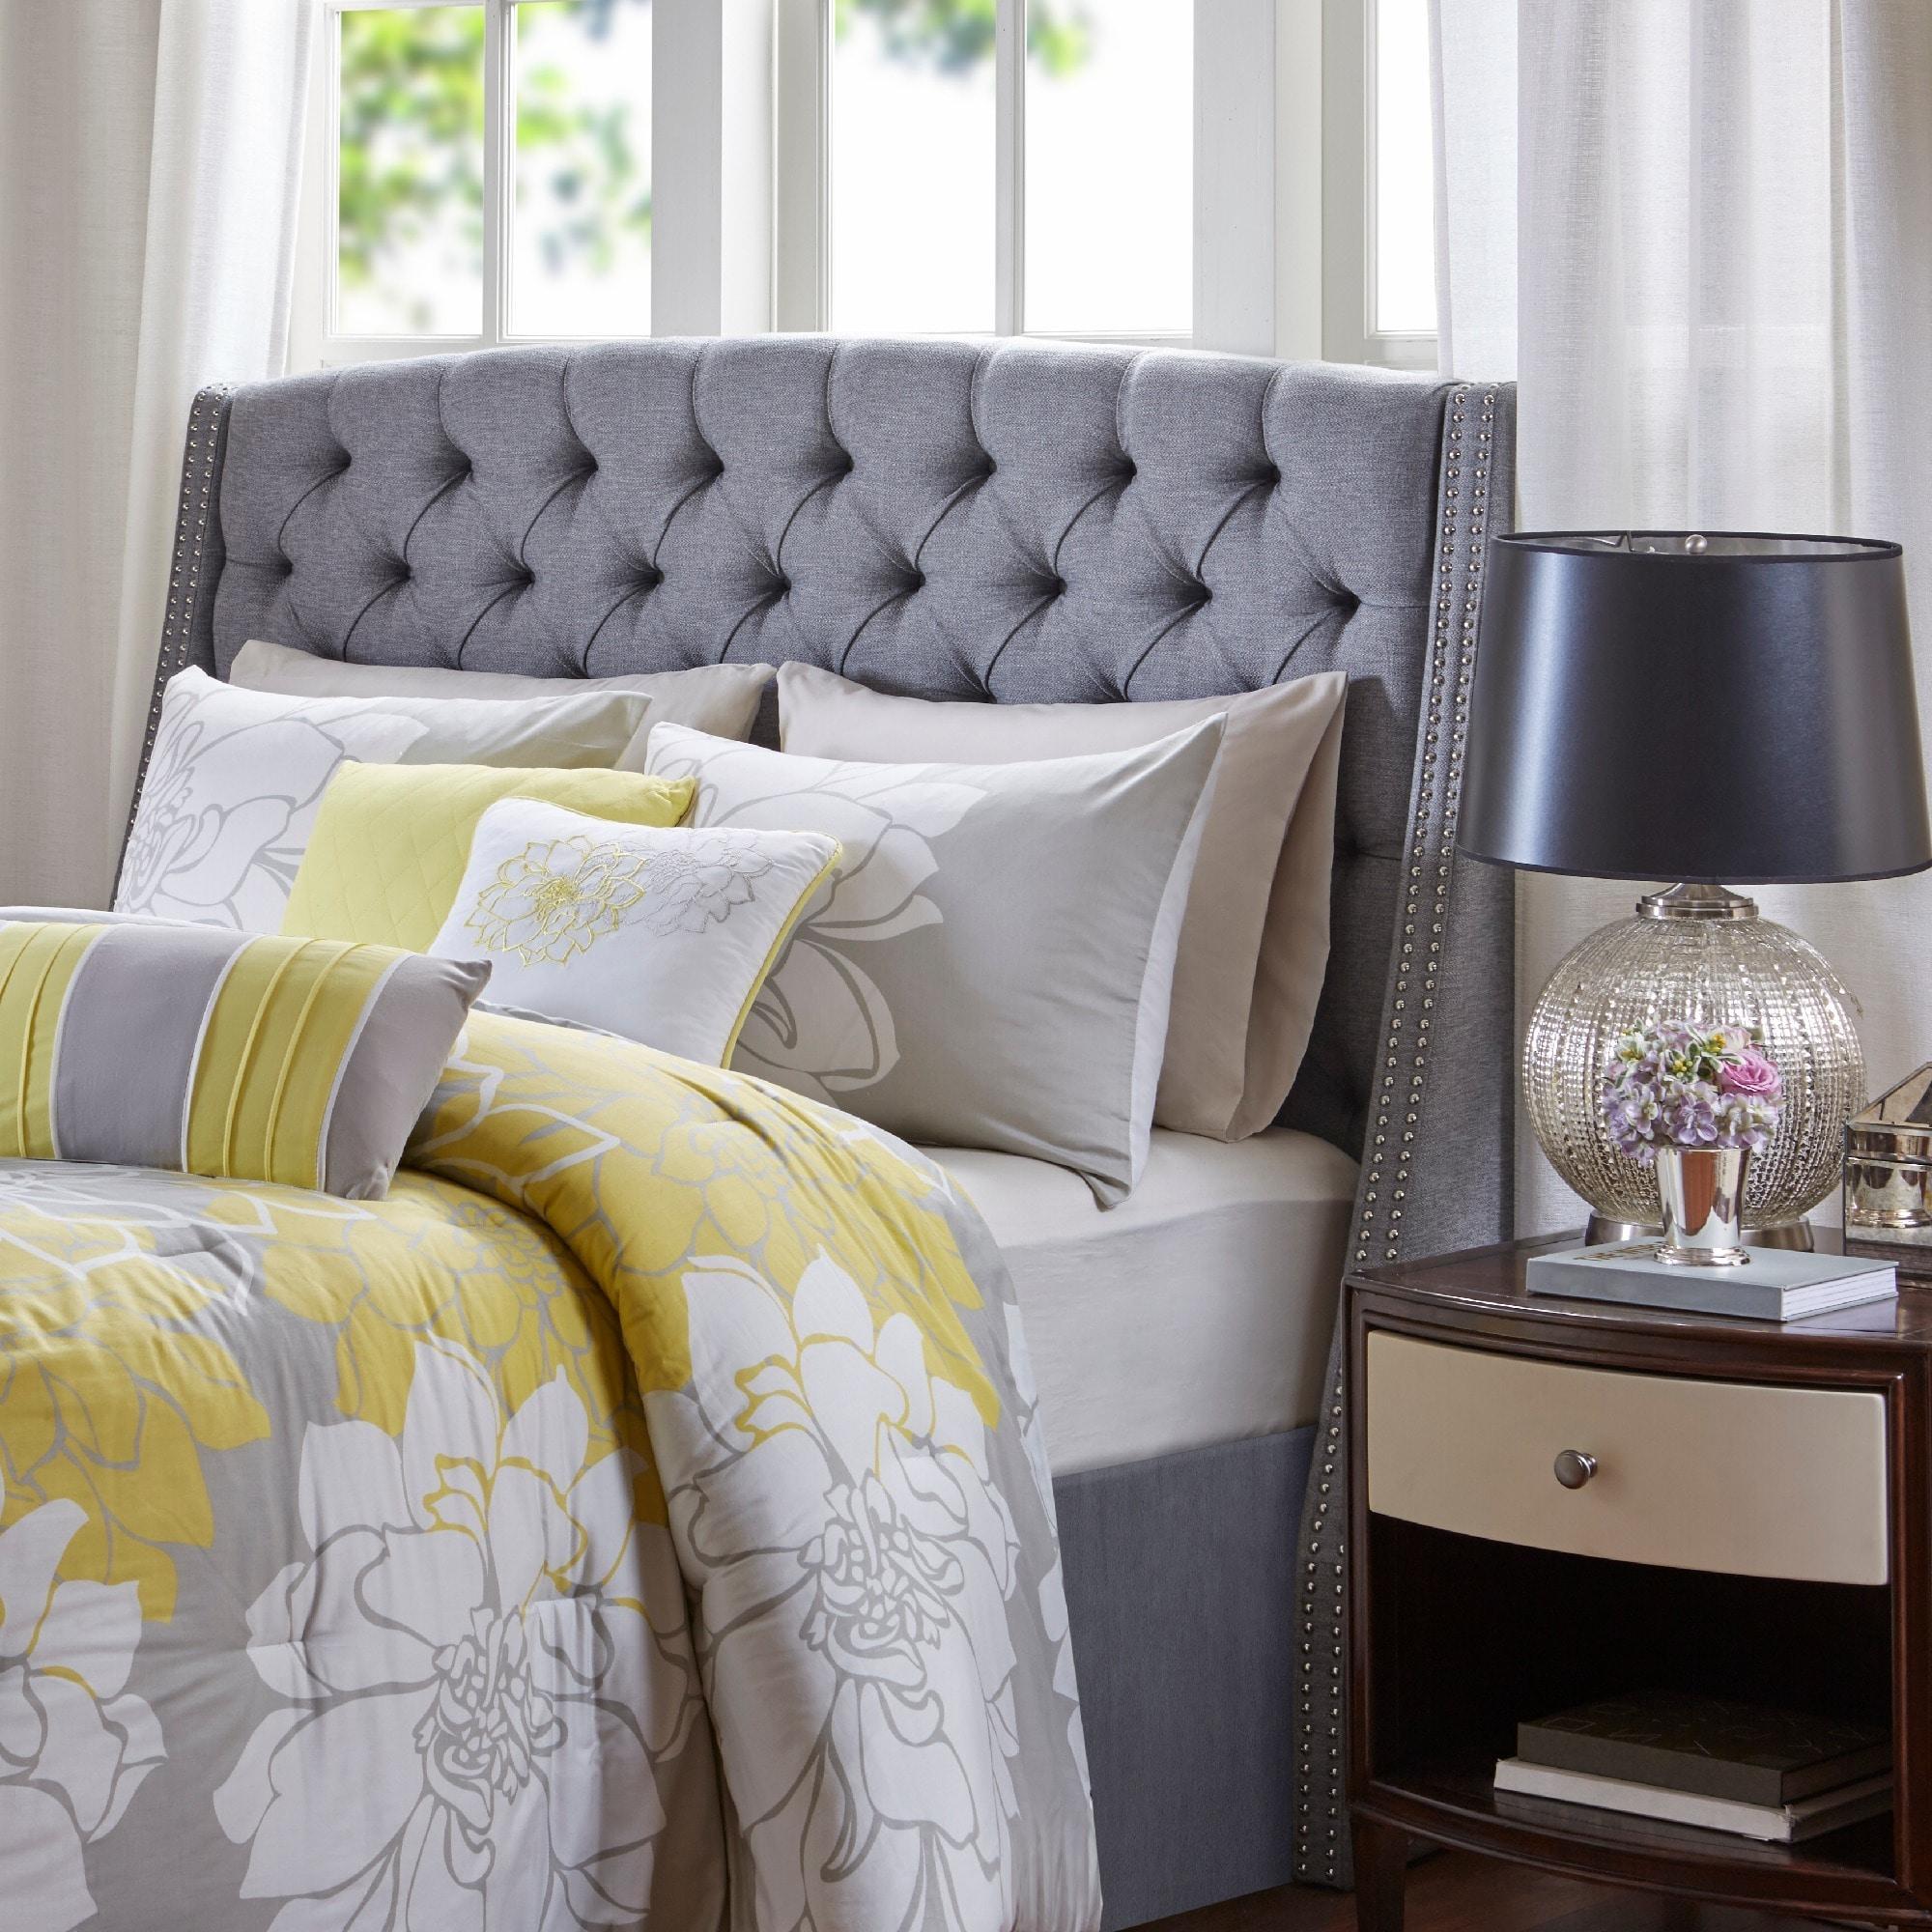 Shop madison park estella grey upholstery headboard free shipping today overstock com 15871108